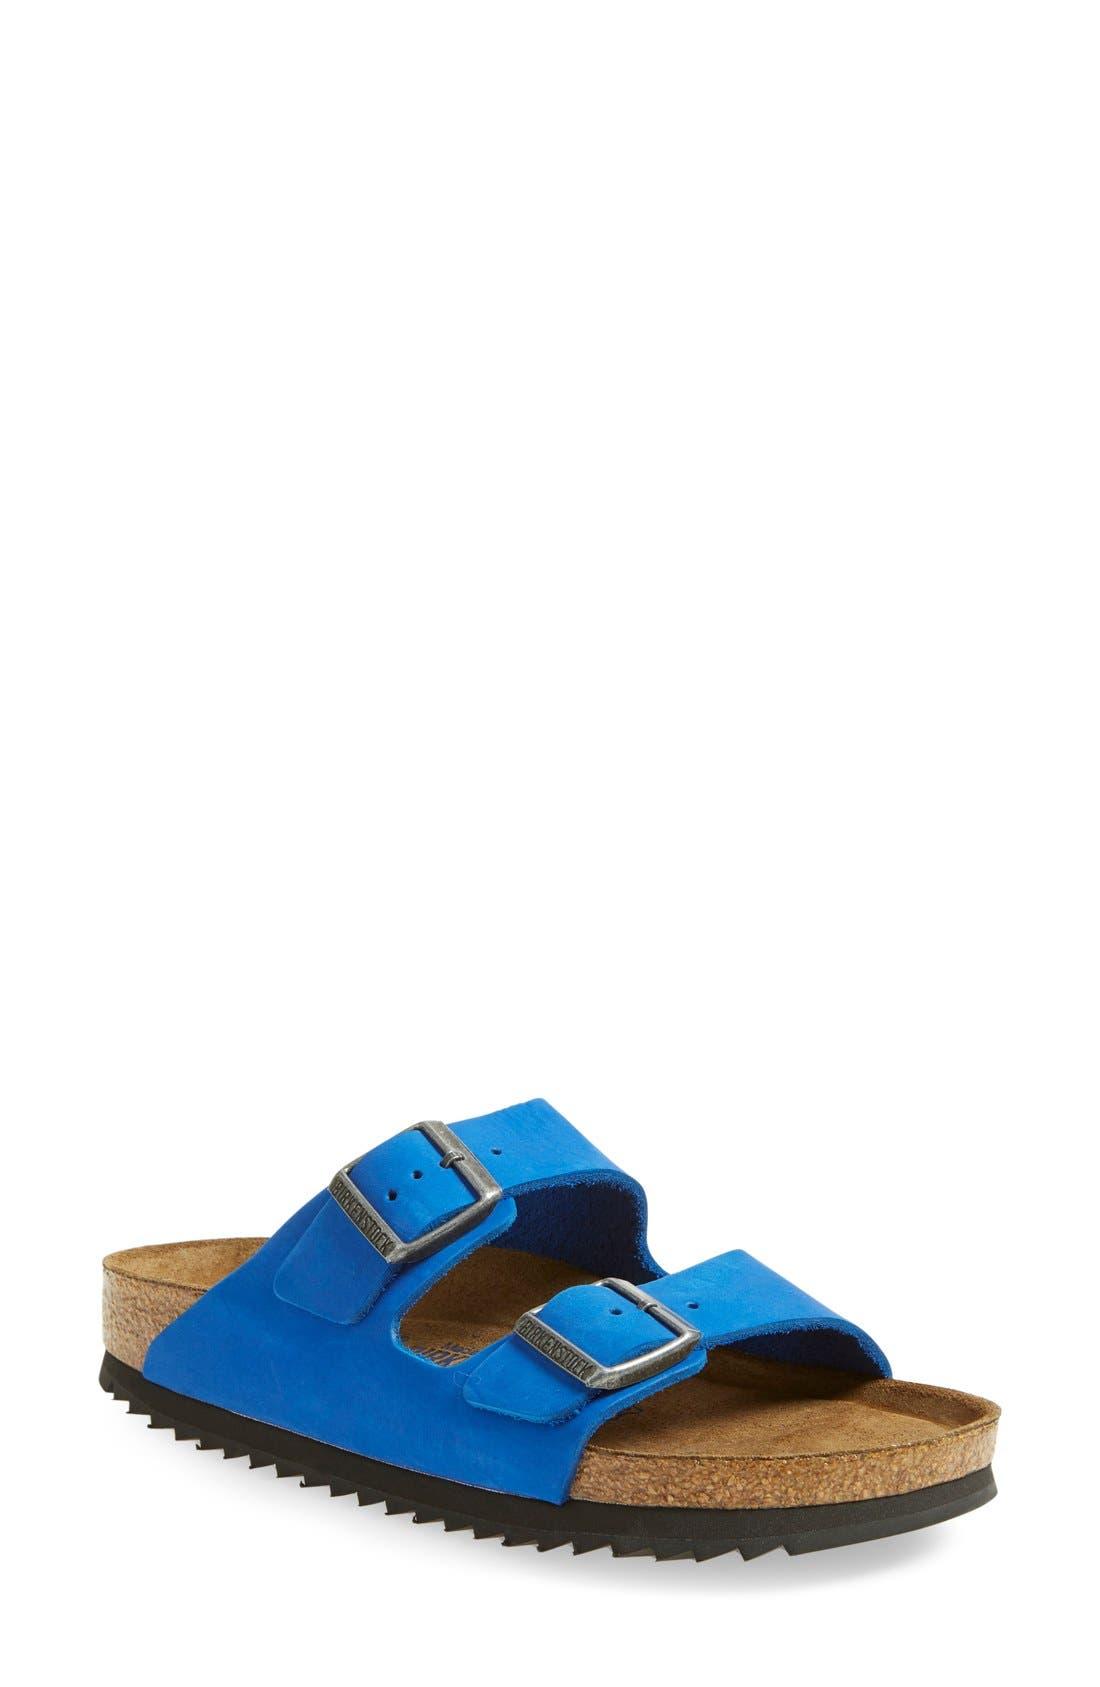 'Arizona' Sandal,                         Main,                         color, Blue Nubuck